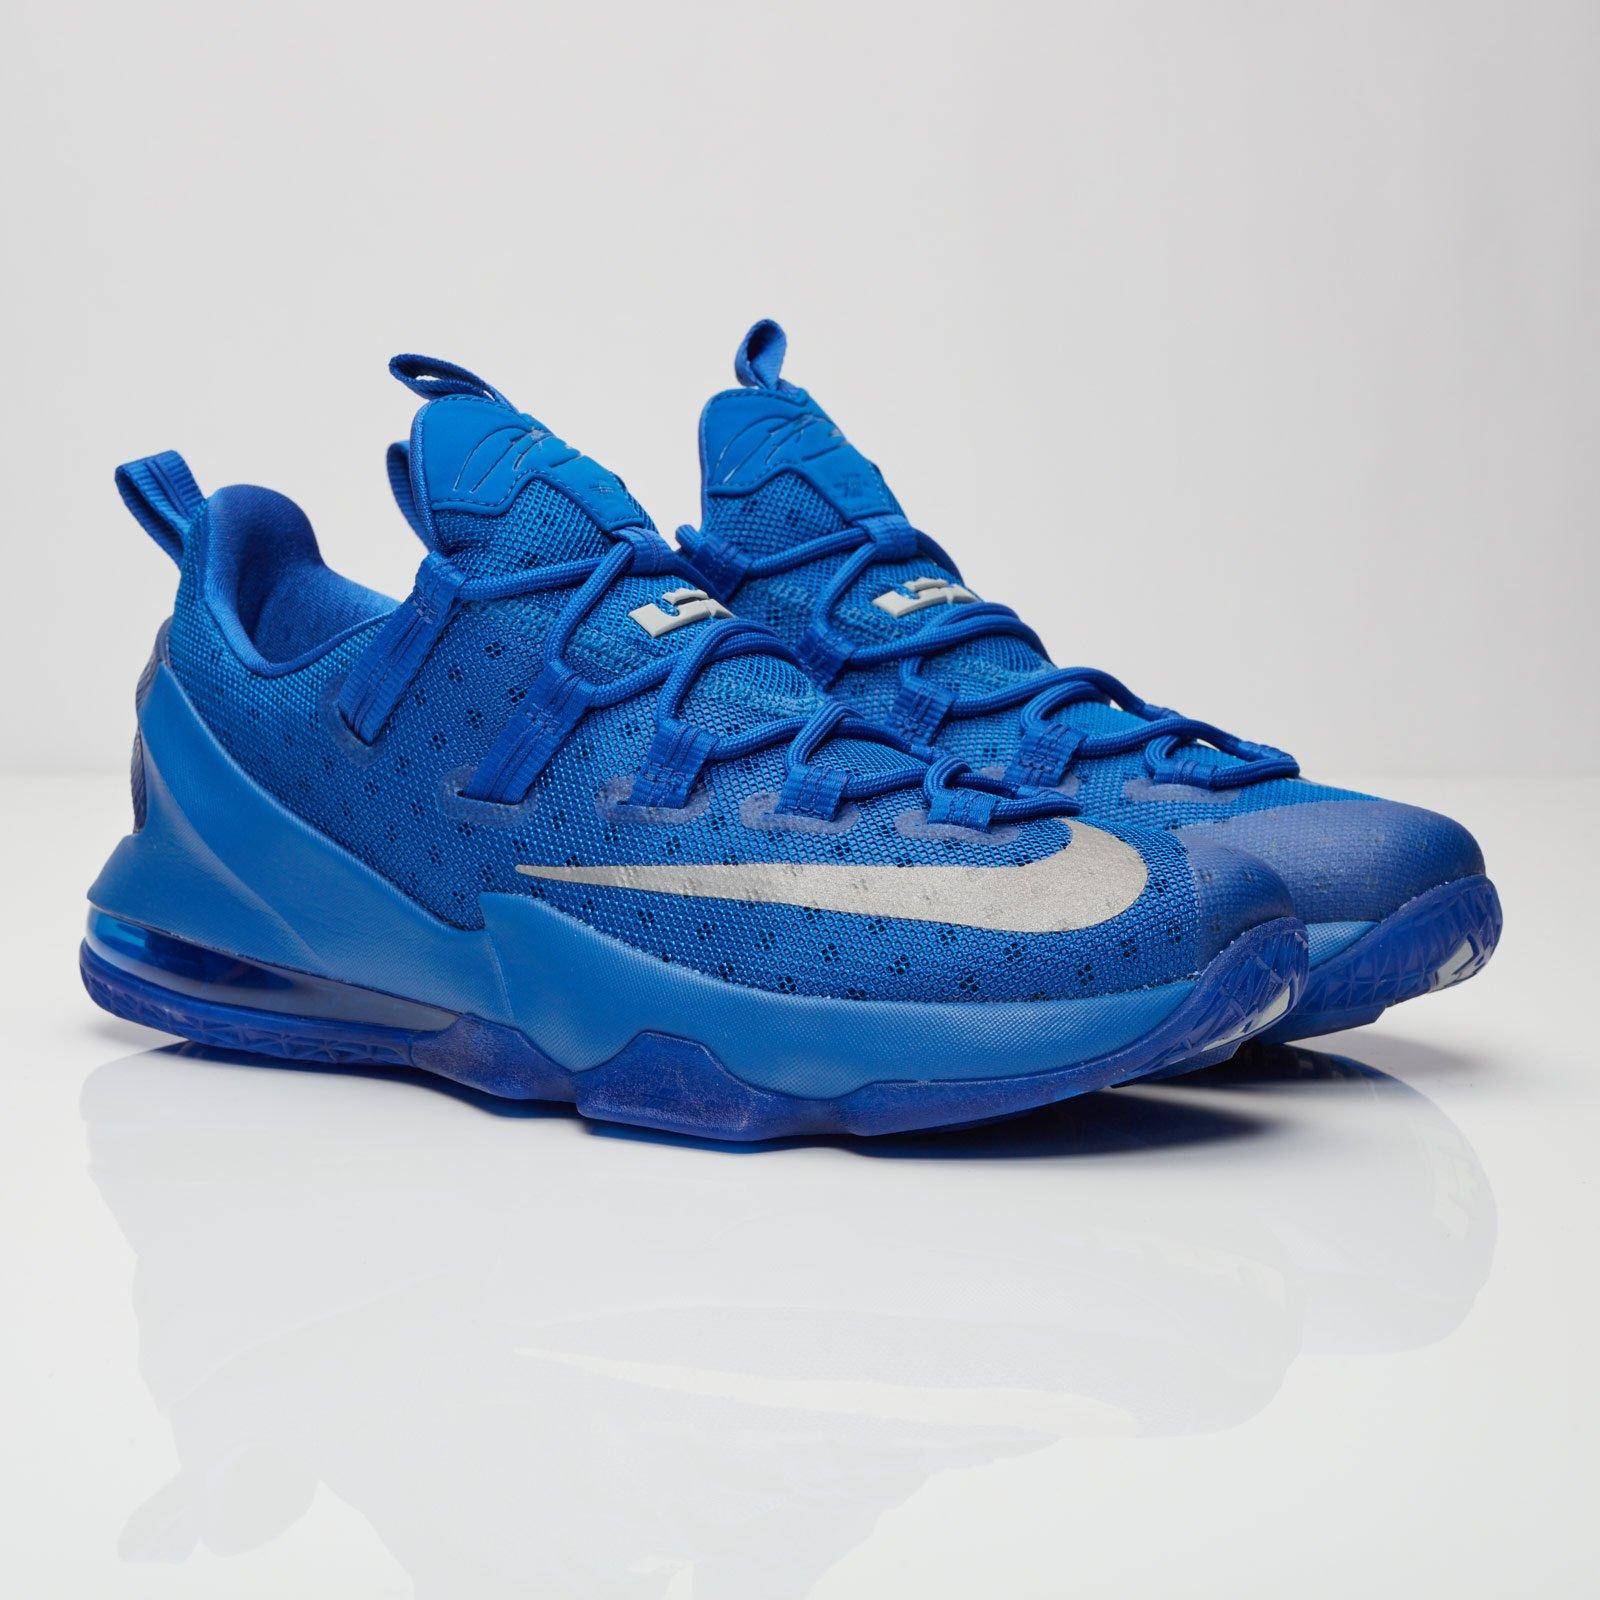 huge discount 2af4f 68345 Nike Lebron XIII Low - 831925-400 - Sneakersnstuff ...